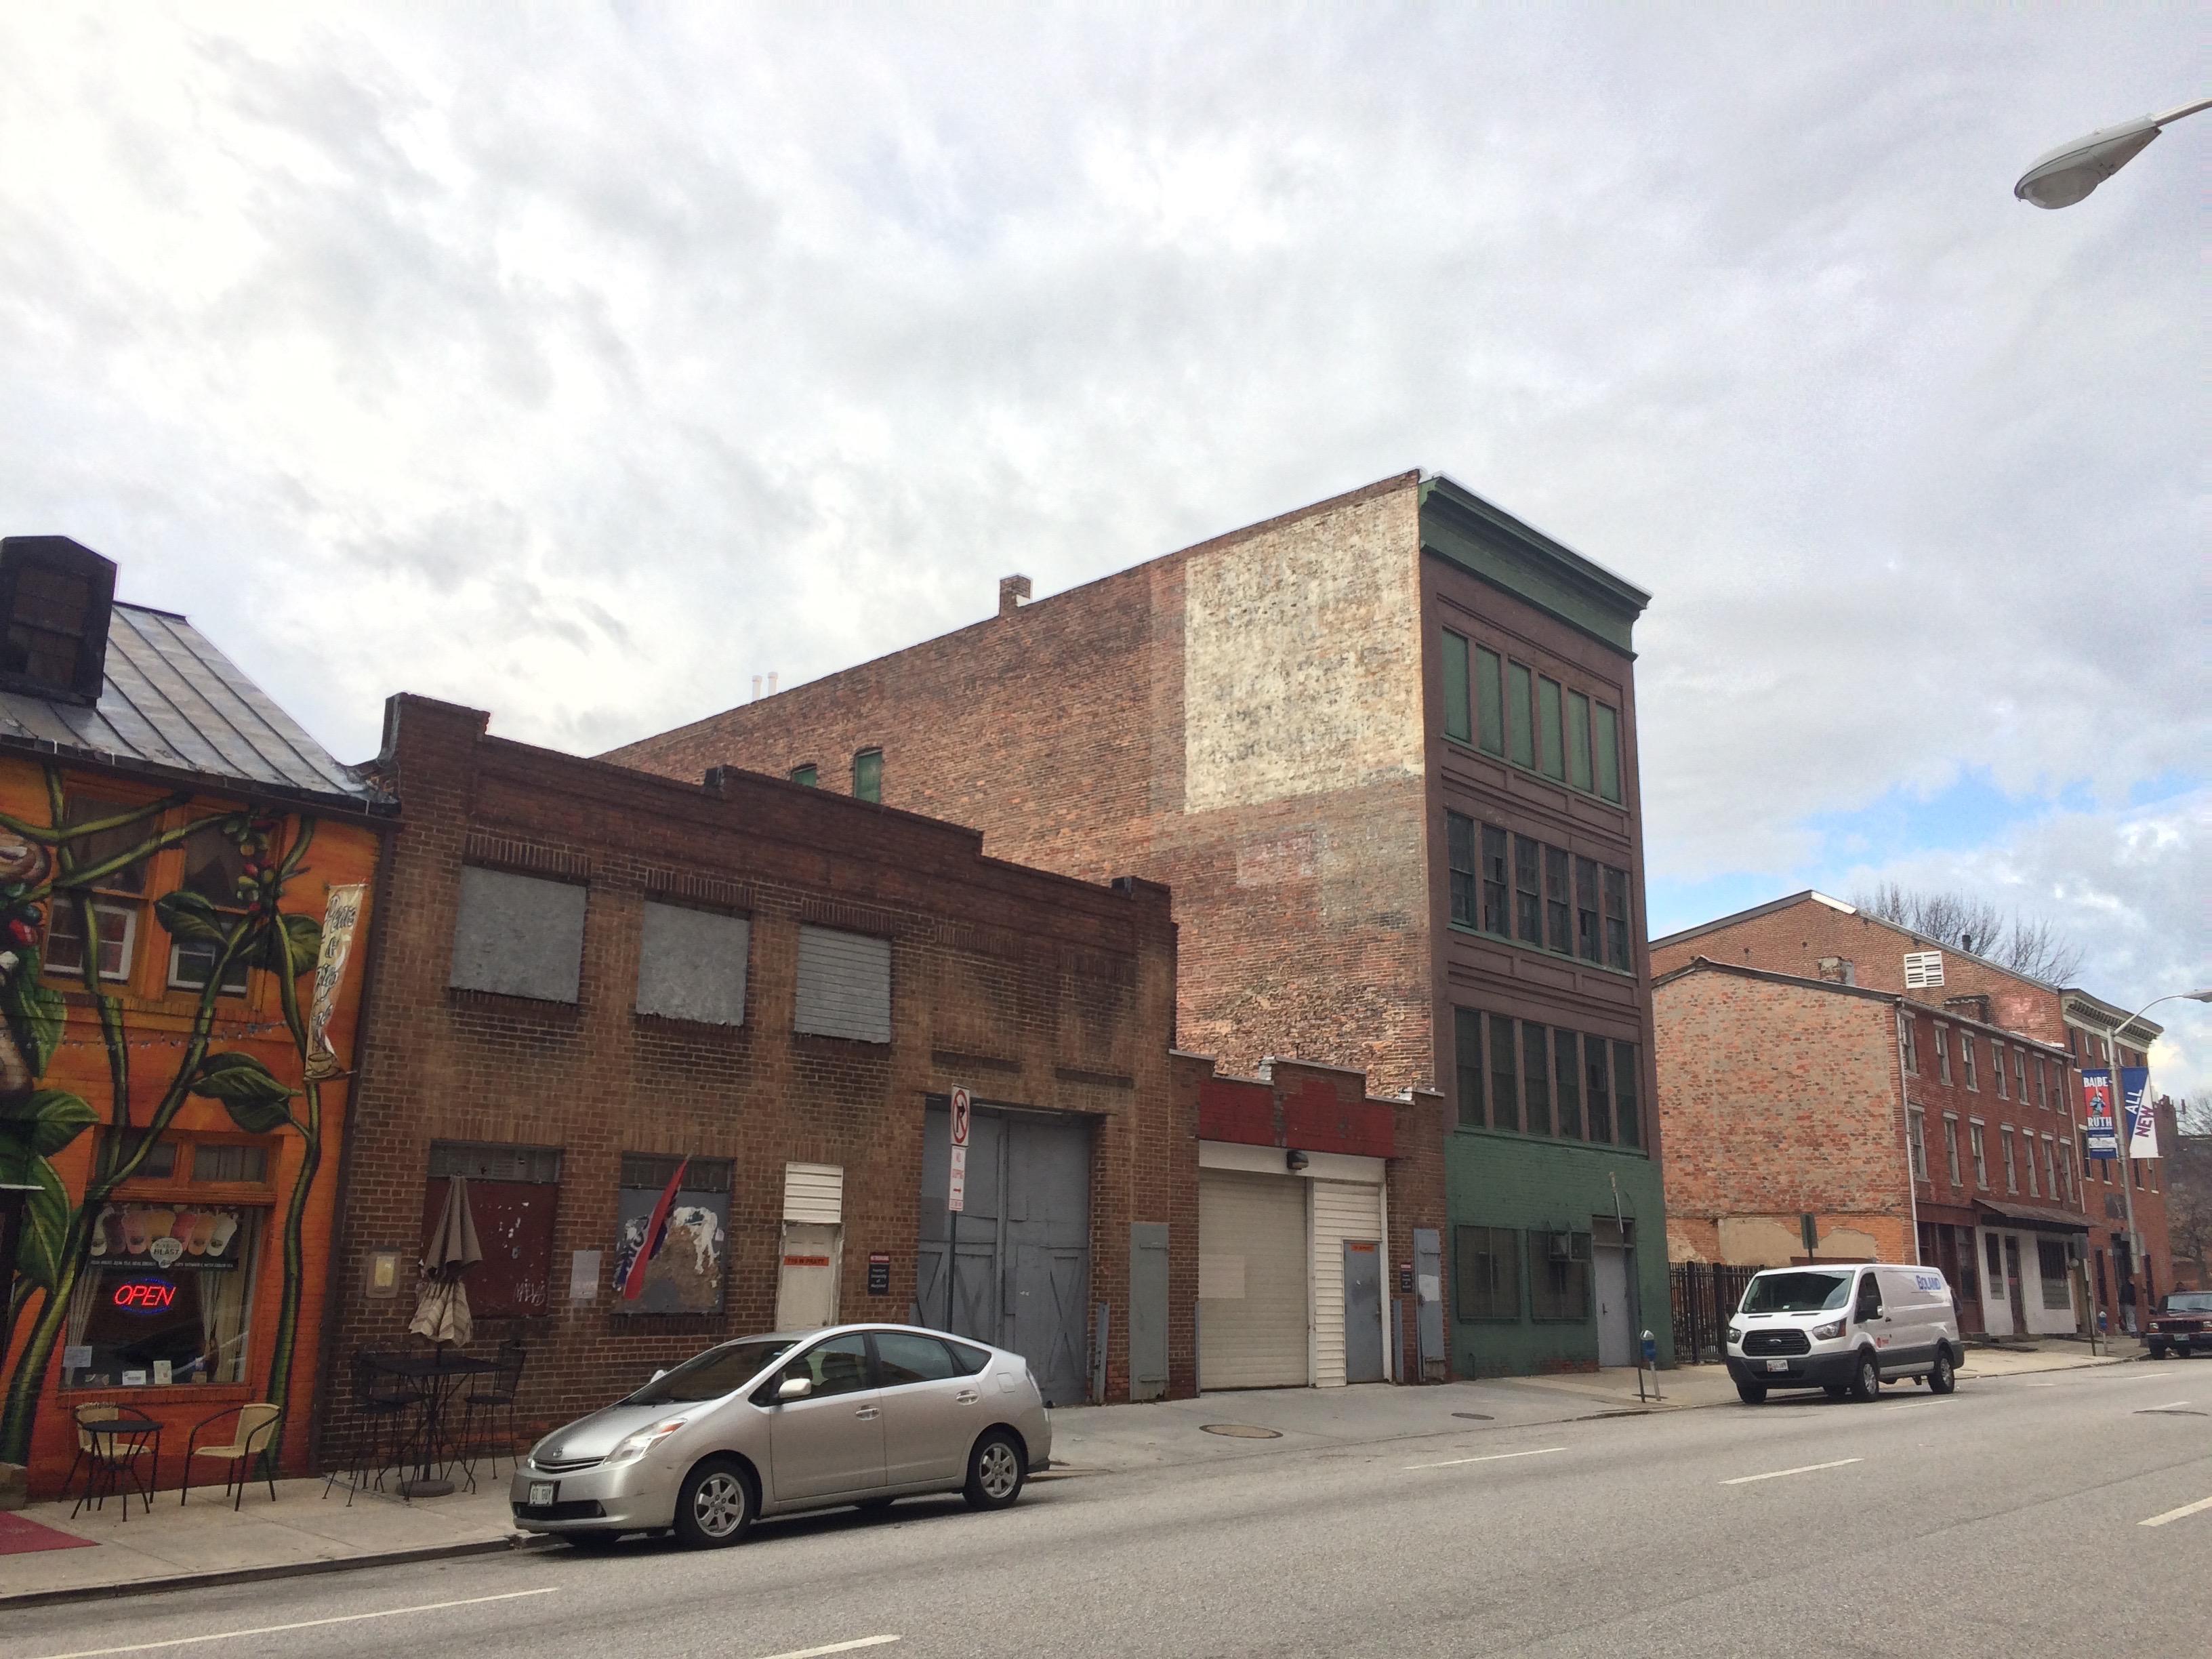 Vacant warehouse/industrial building (1914), 723 W. Pratt Street, Baltimore, MD 21230, Baltimore, Building, Car, Industrial building, HQ Photo